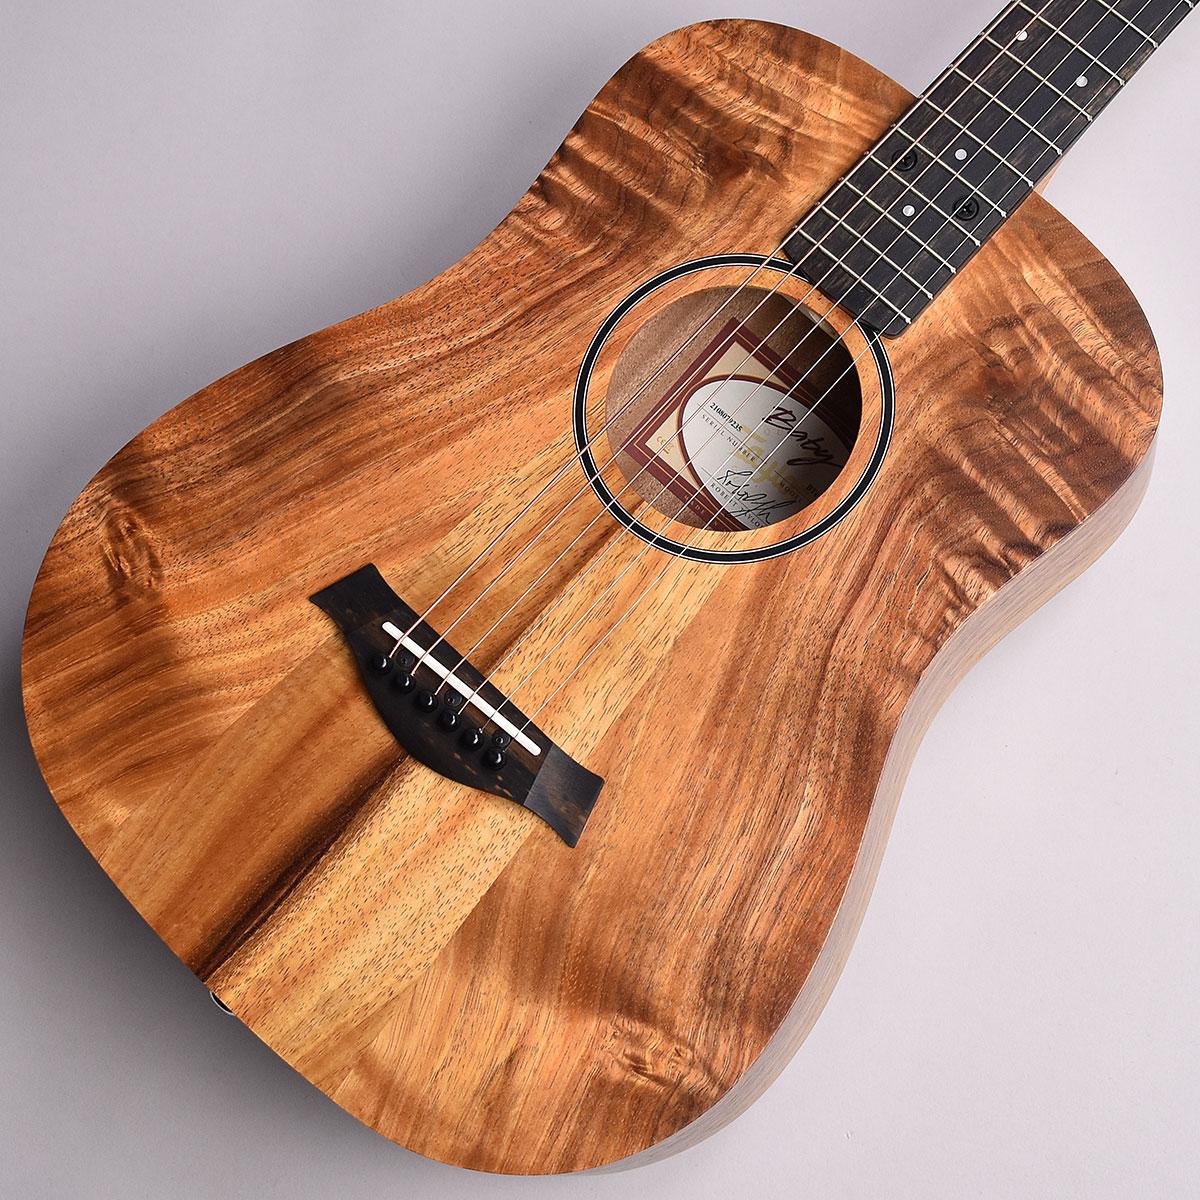 Taylor Baby Taylor-e Koa S/N:2108079235 ミニアコースティックギター【エレアコ】 【テイラー】【未展示品】